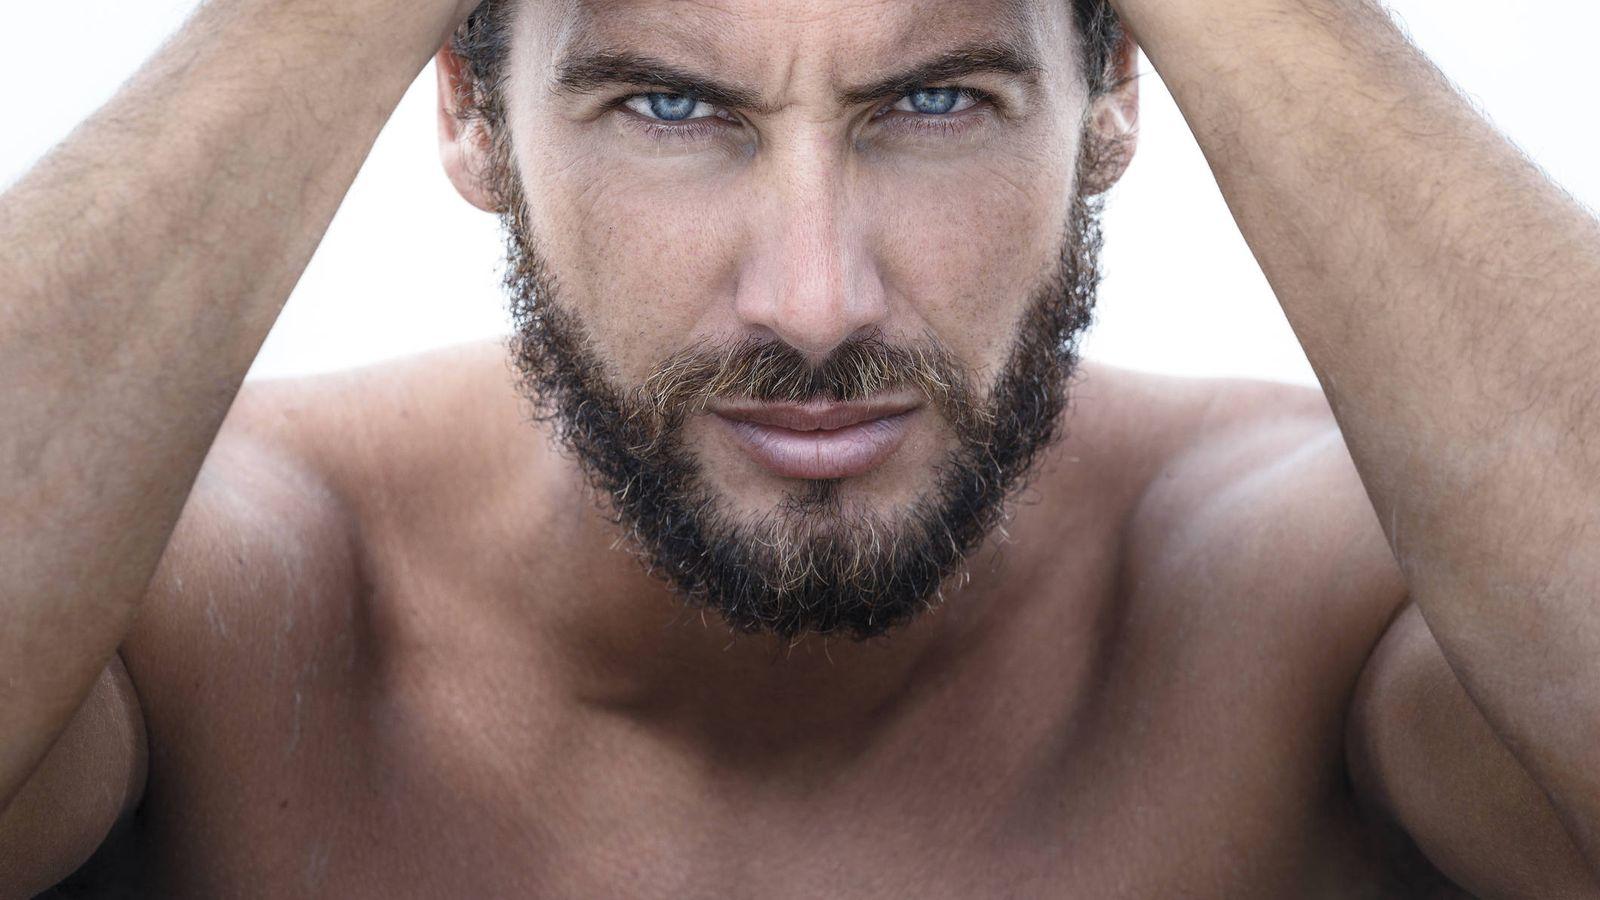 Mujeres prefieren hombres pelo largo o corto